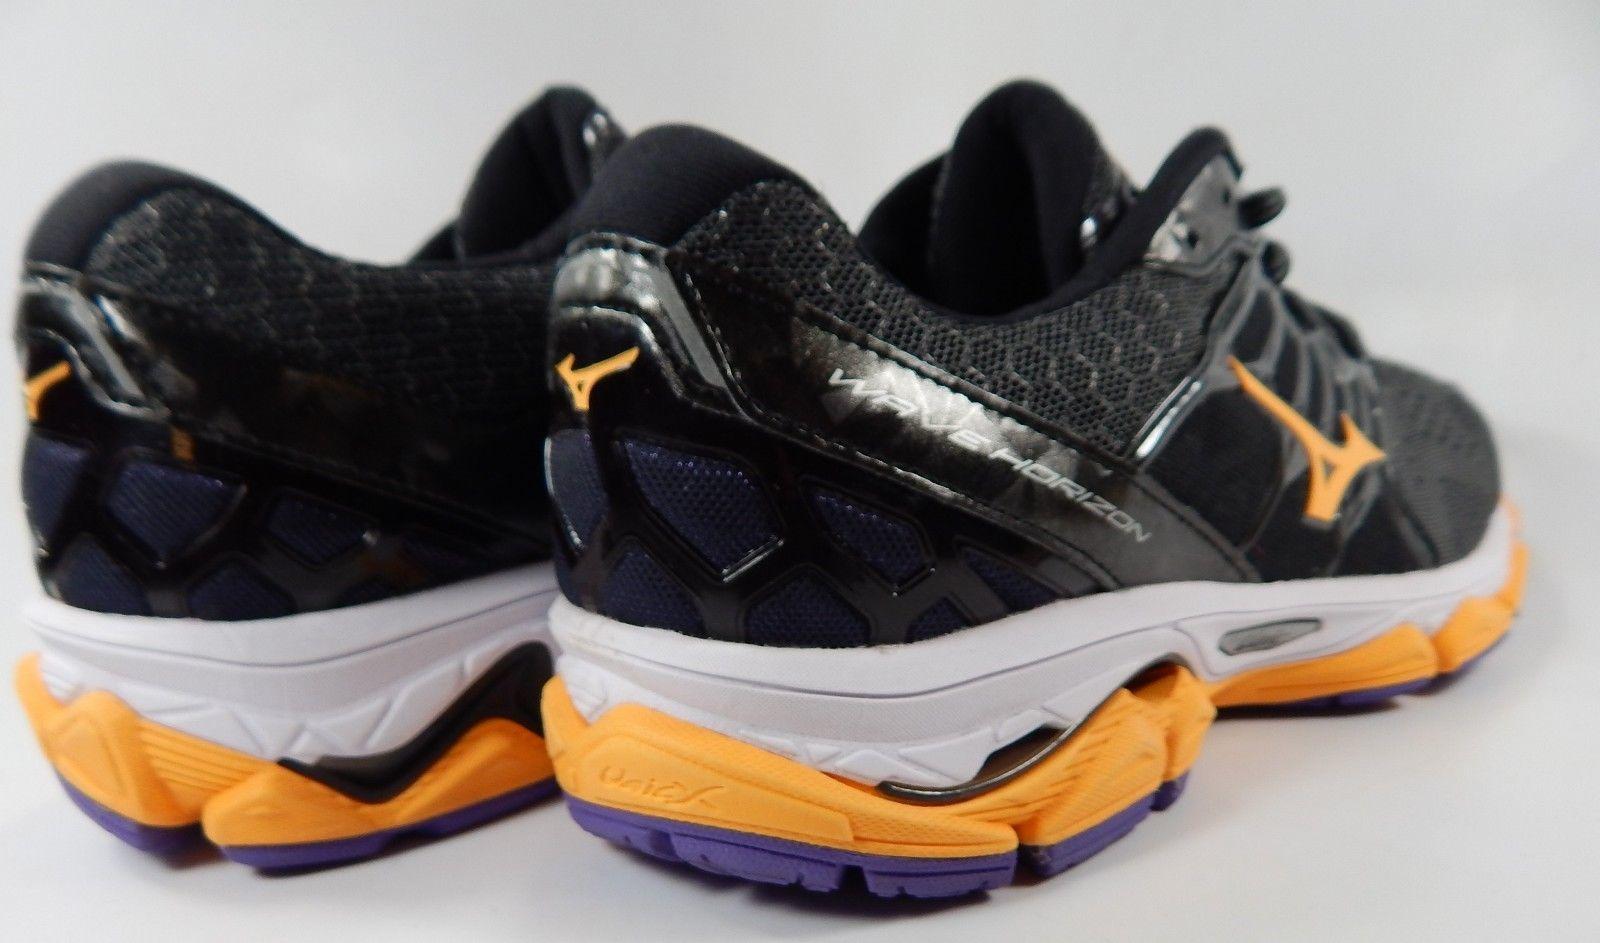 Mizuno Wave Horizon Size US 10 M (B) EU 41 Women's Running Shoes Gray Orange